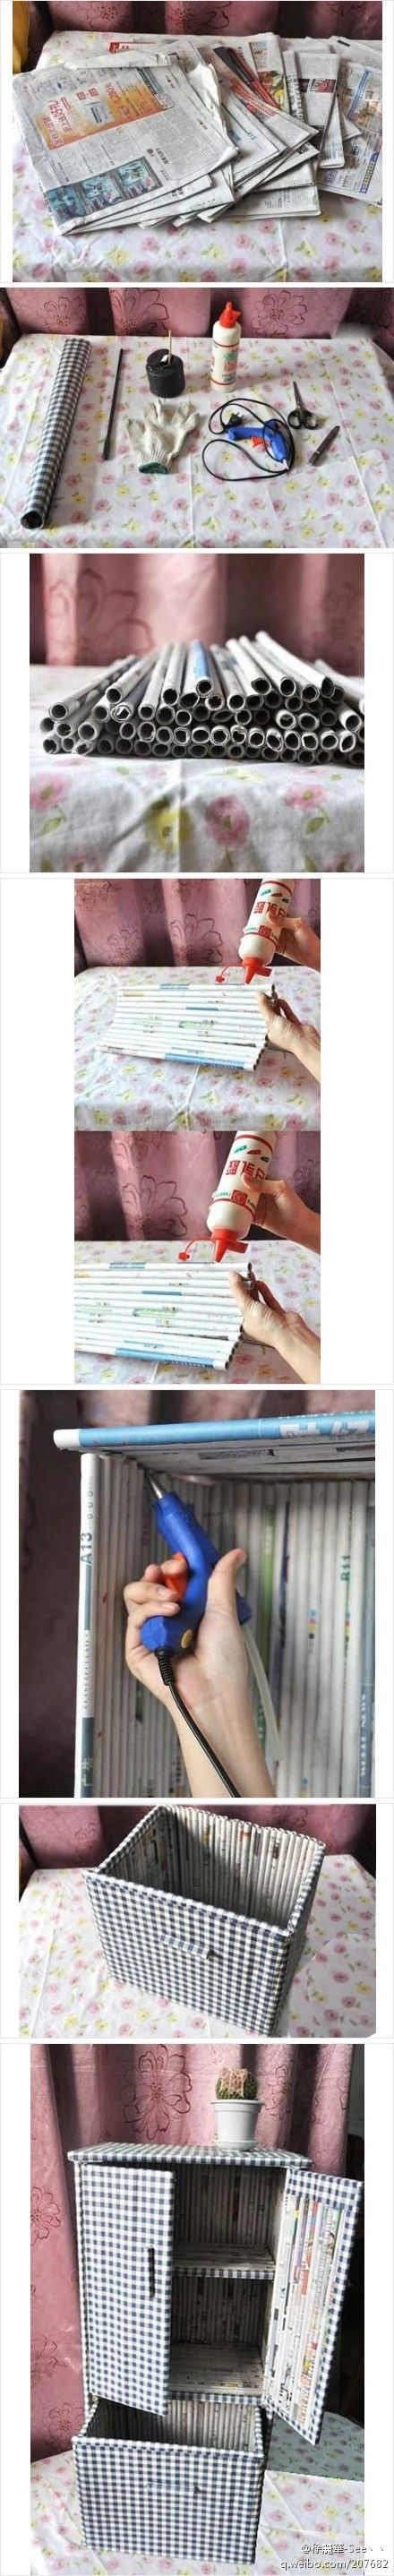 DIY newspaper furniture. Great way to recycle newspaper.